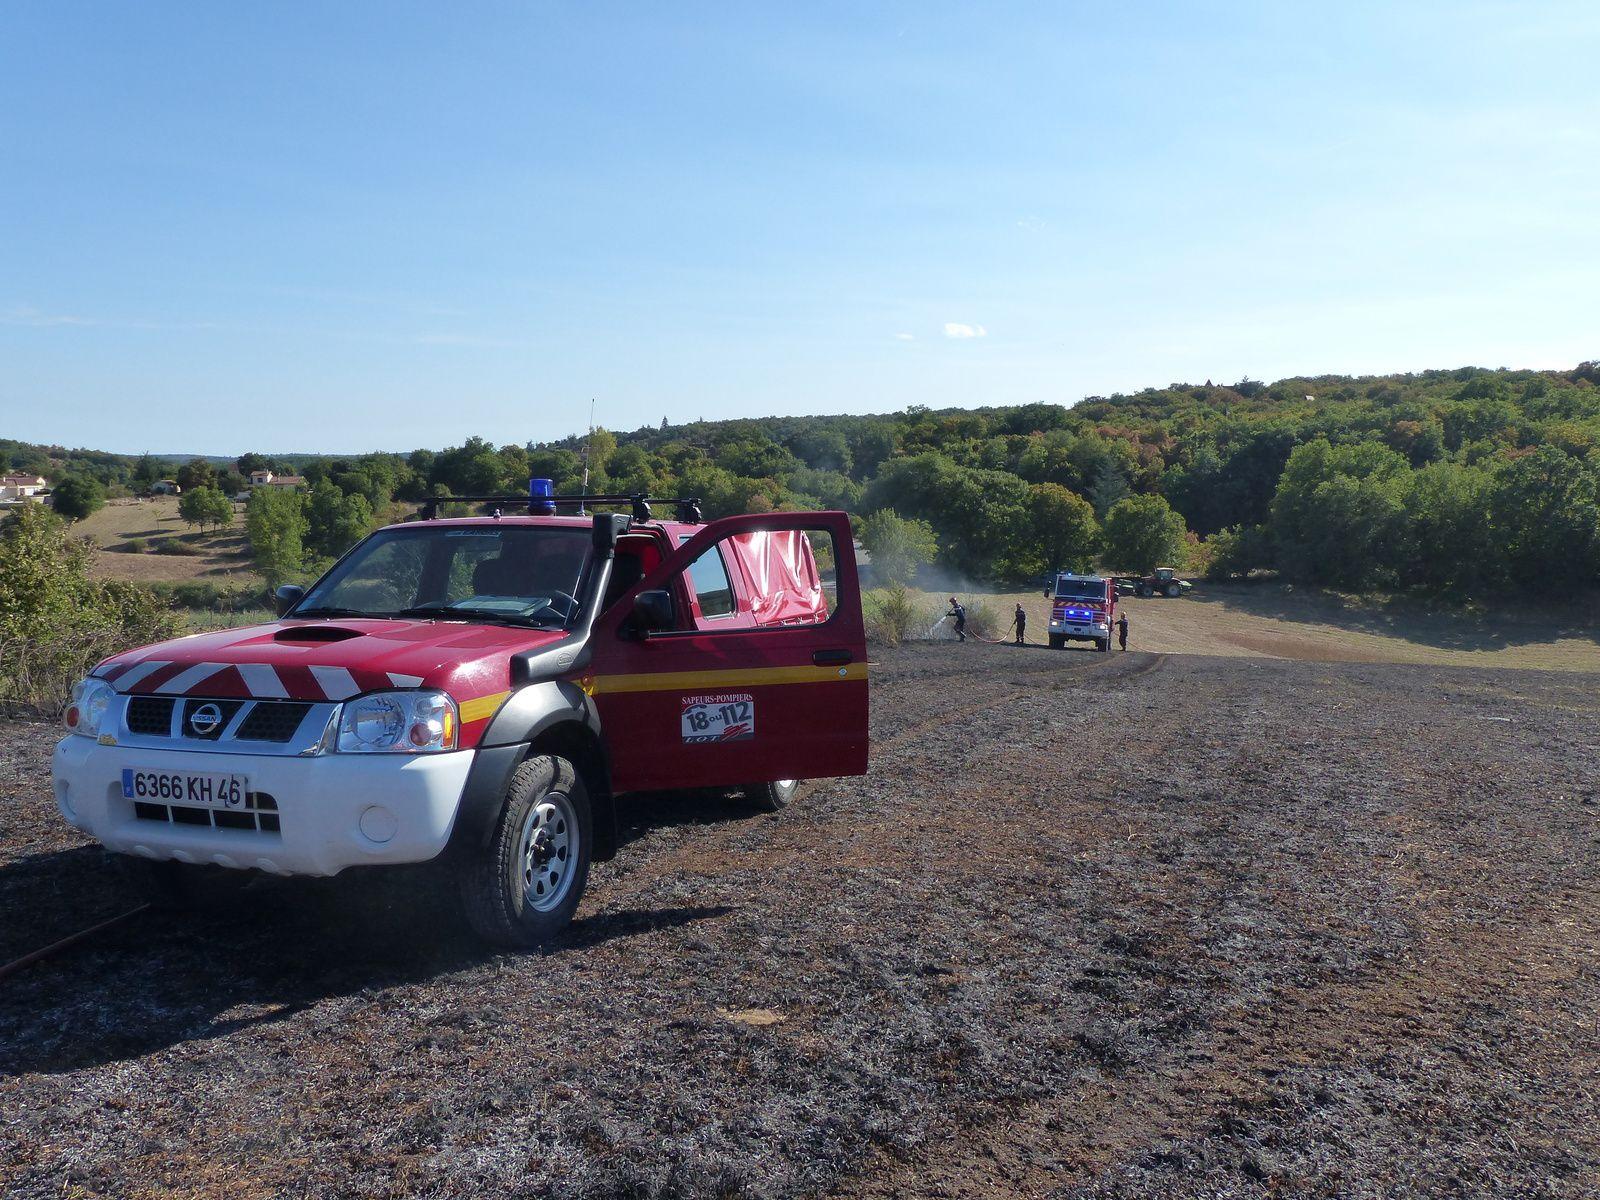 Crayssac (46) - Incendie de végétation au Mas de Mirol